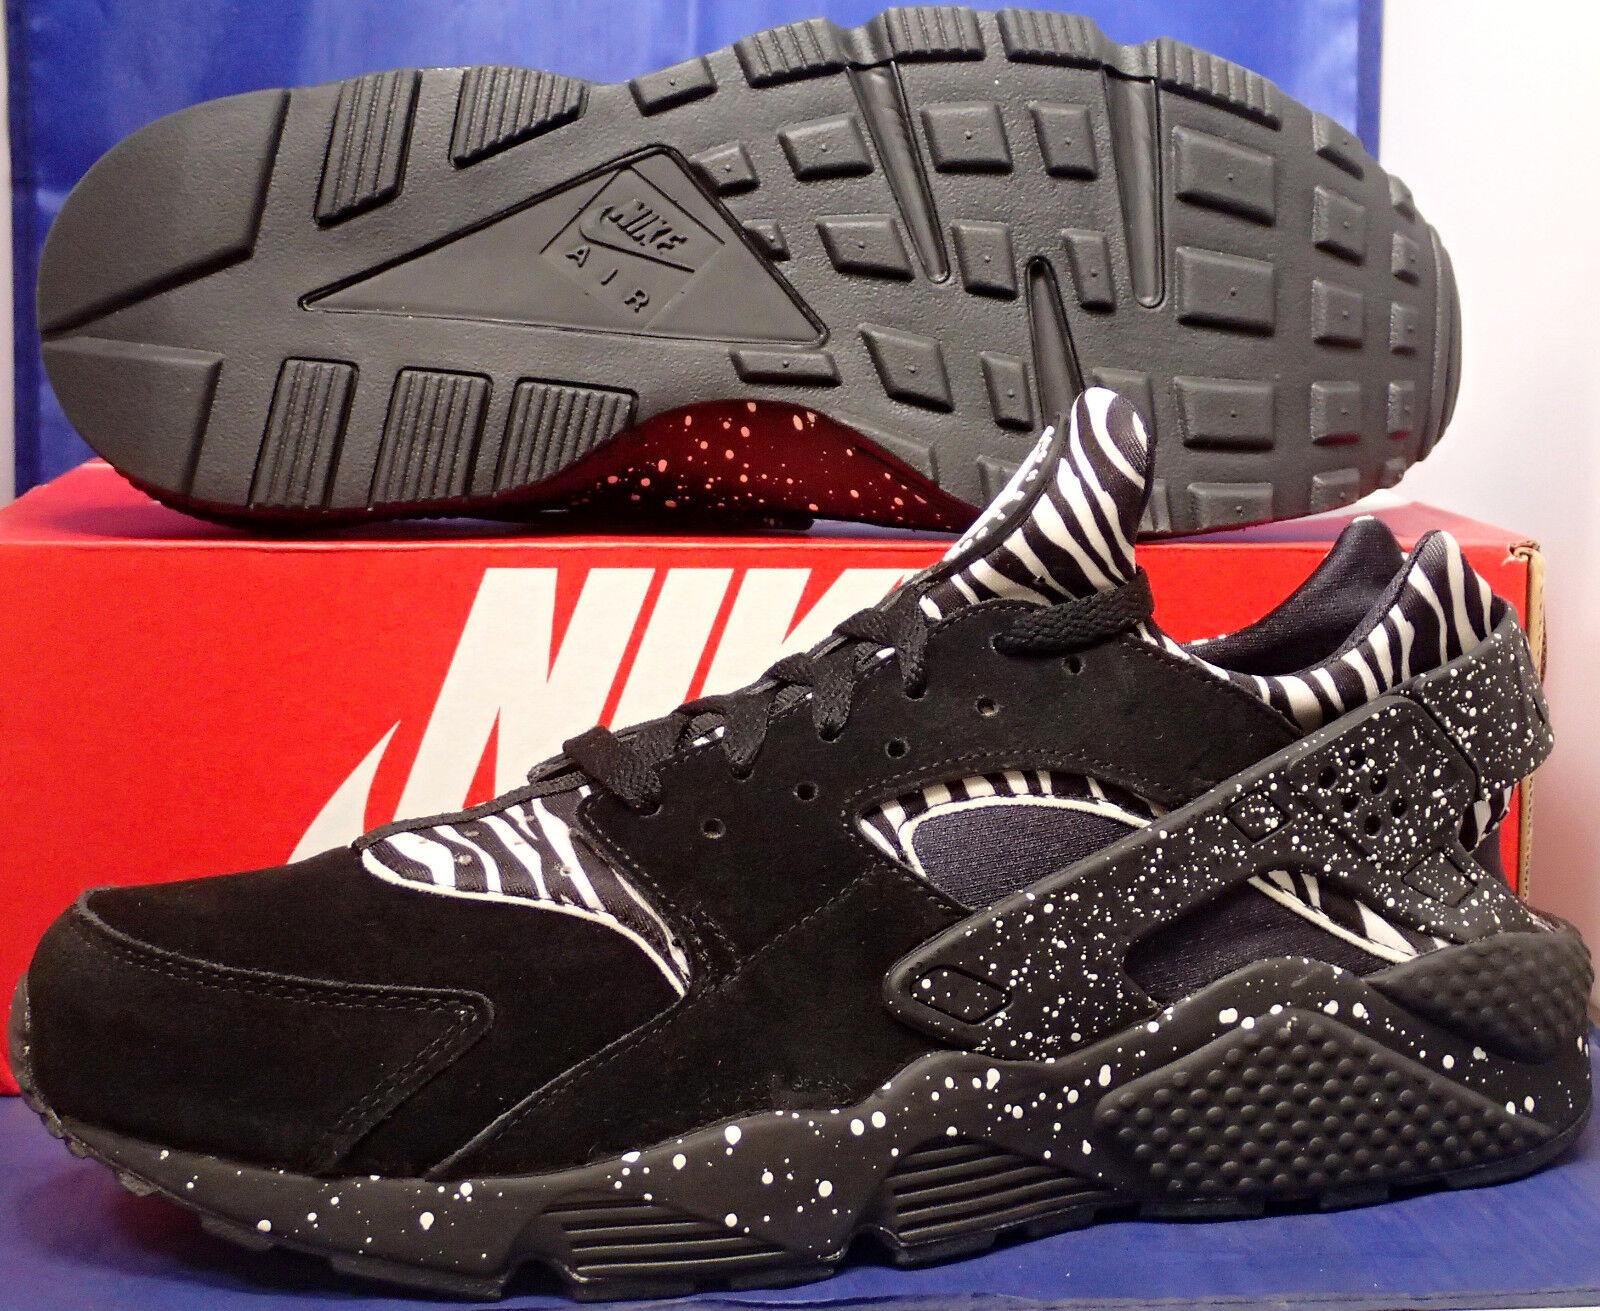 3bd25ae0871c Nike Air Huarache Run iD Black White Zebra Print SZ 13 ( 777330-998 ...